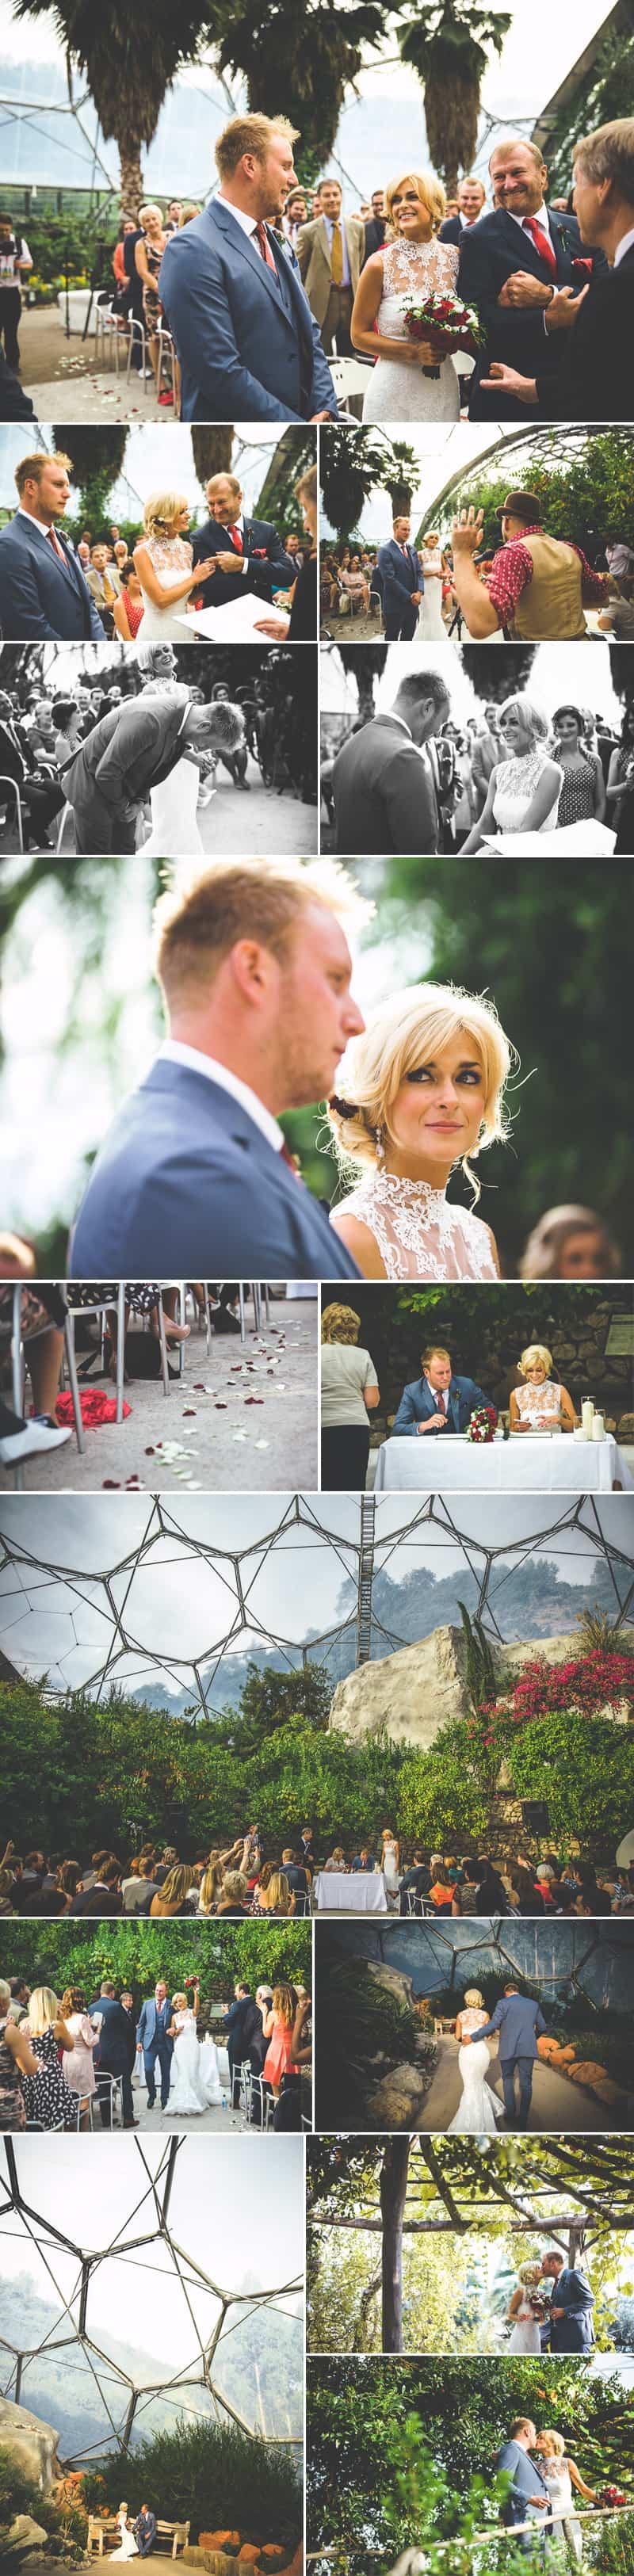 Glastonbury Eden Project Wedding Zip Lining Festival Themed 3